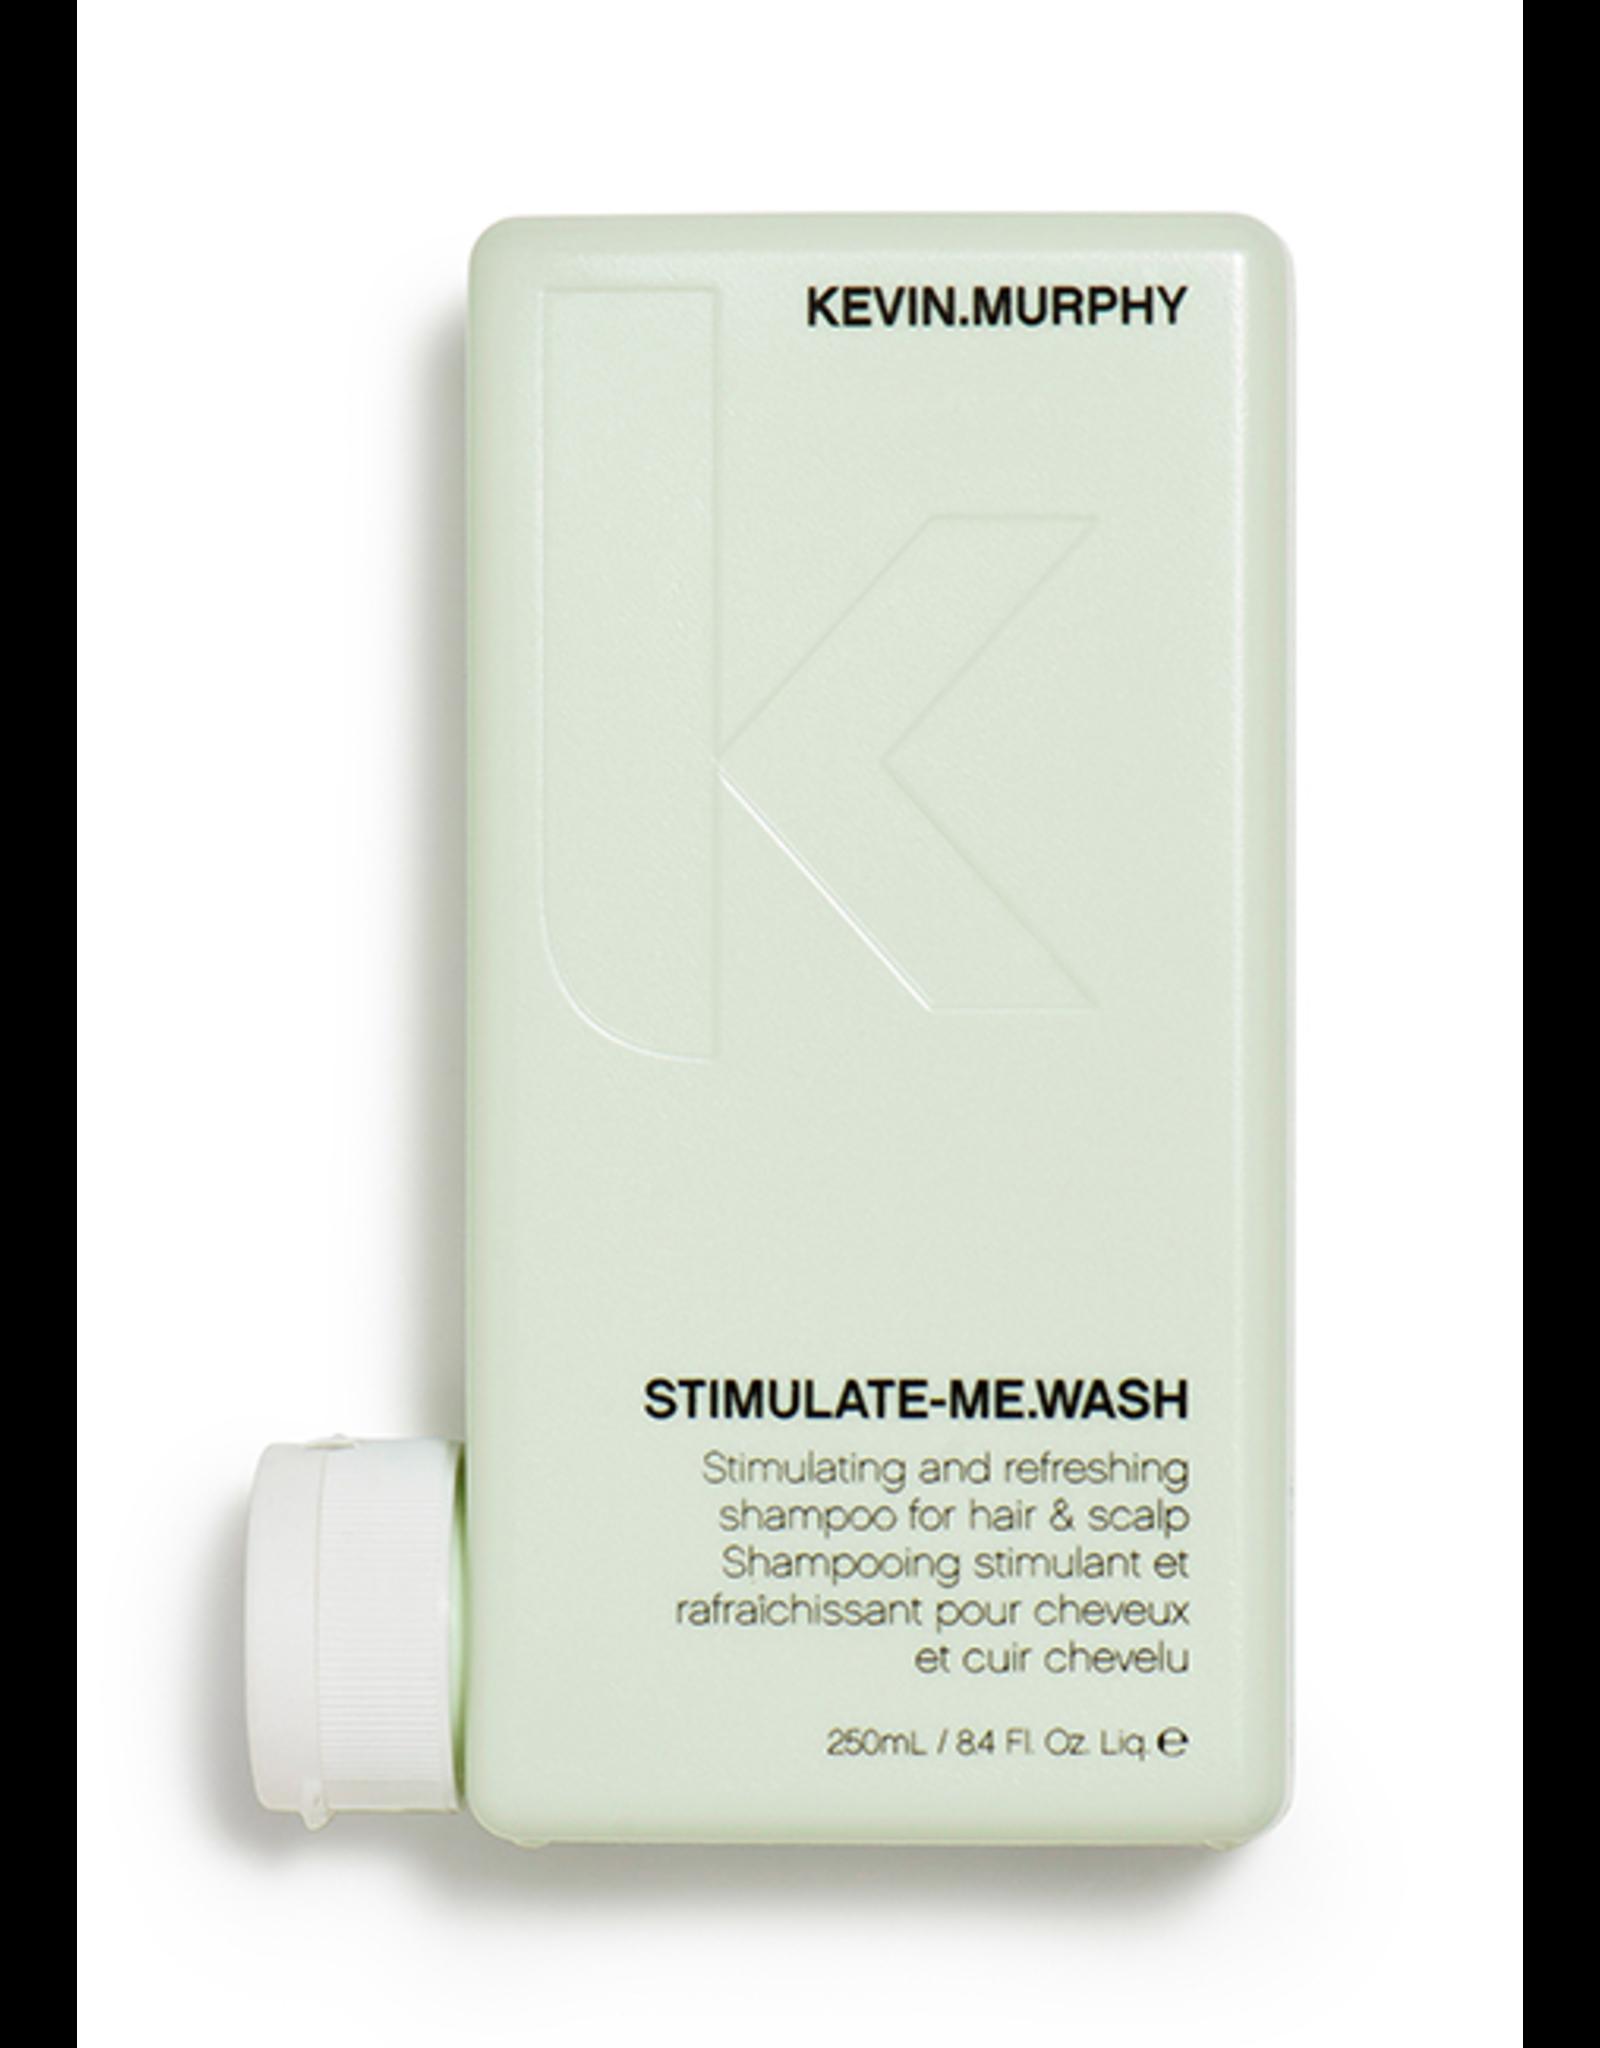 KEVIN.MURPHY Stimulate-Me.Wash (250 ml)